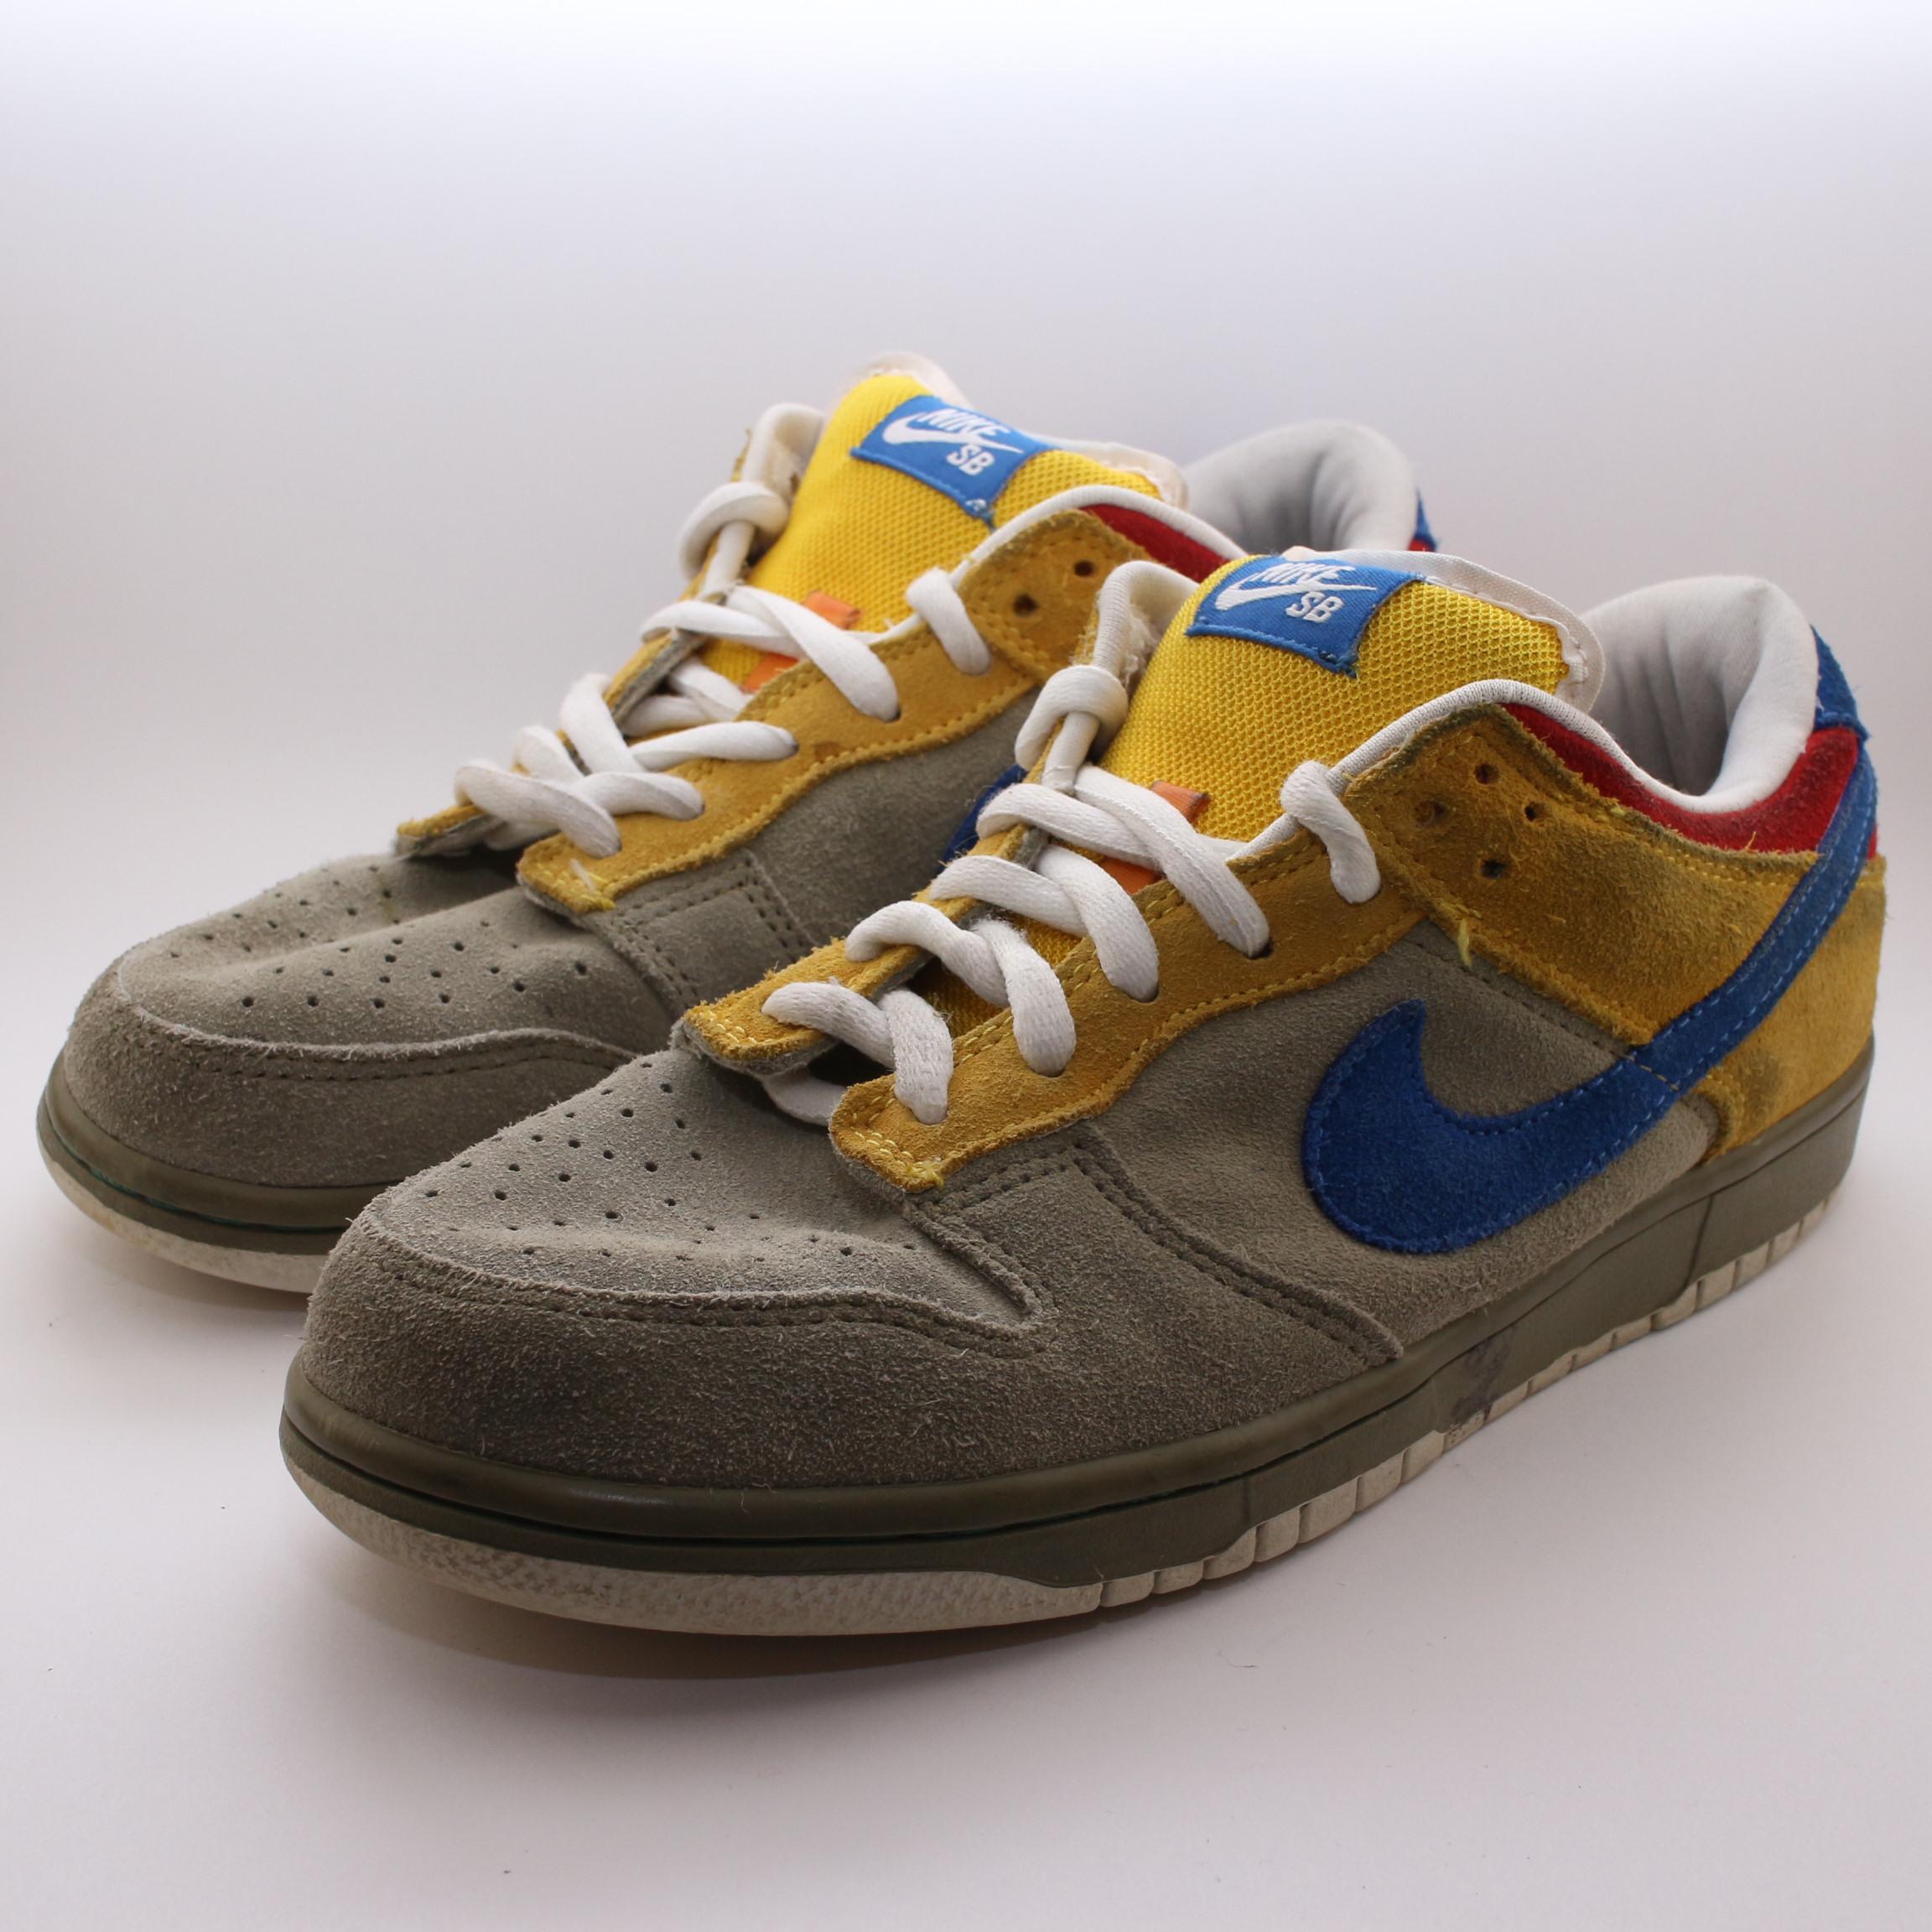 meet 21651 e7637 Nike ×. Nike SB Dunk Low Premium 2006 Puff N Stuff ...